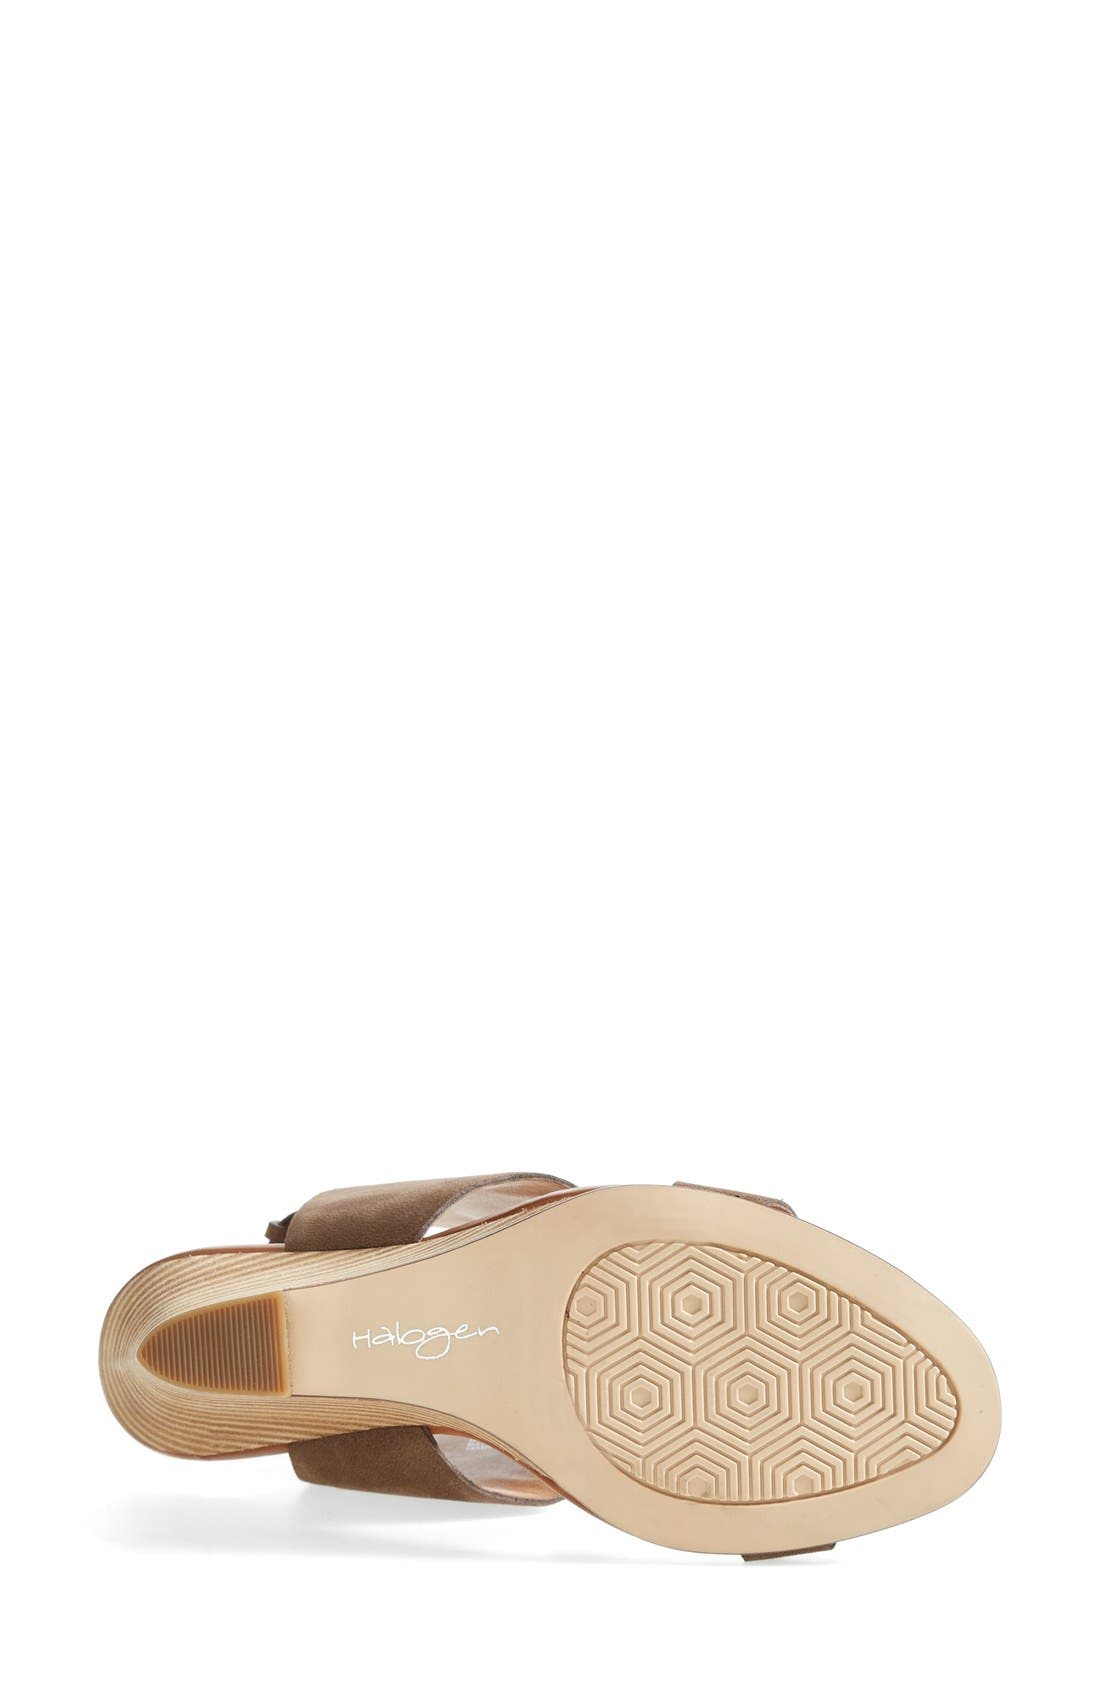 'Clarette' Wedge Sandal,                             Alternate thumbnail 4, color,                             030